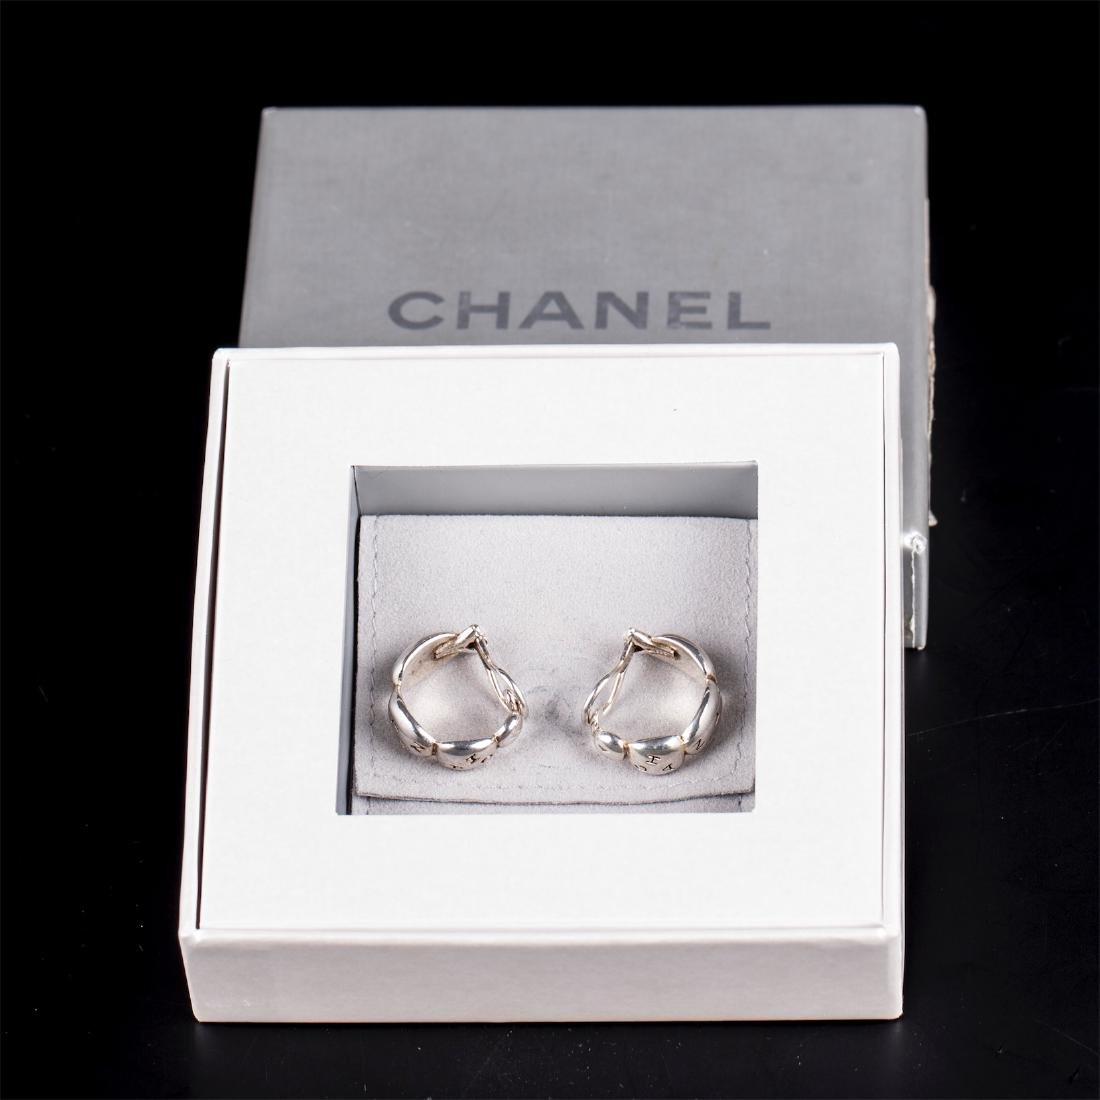 New Chanel silver earclips